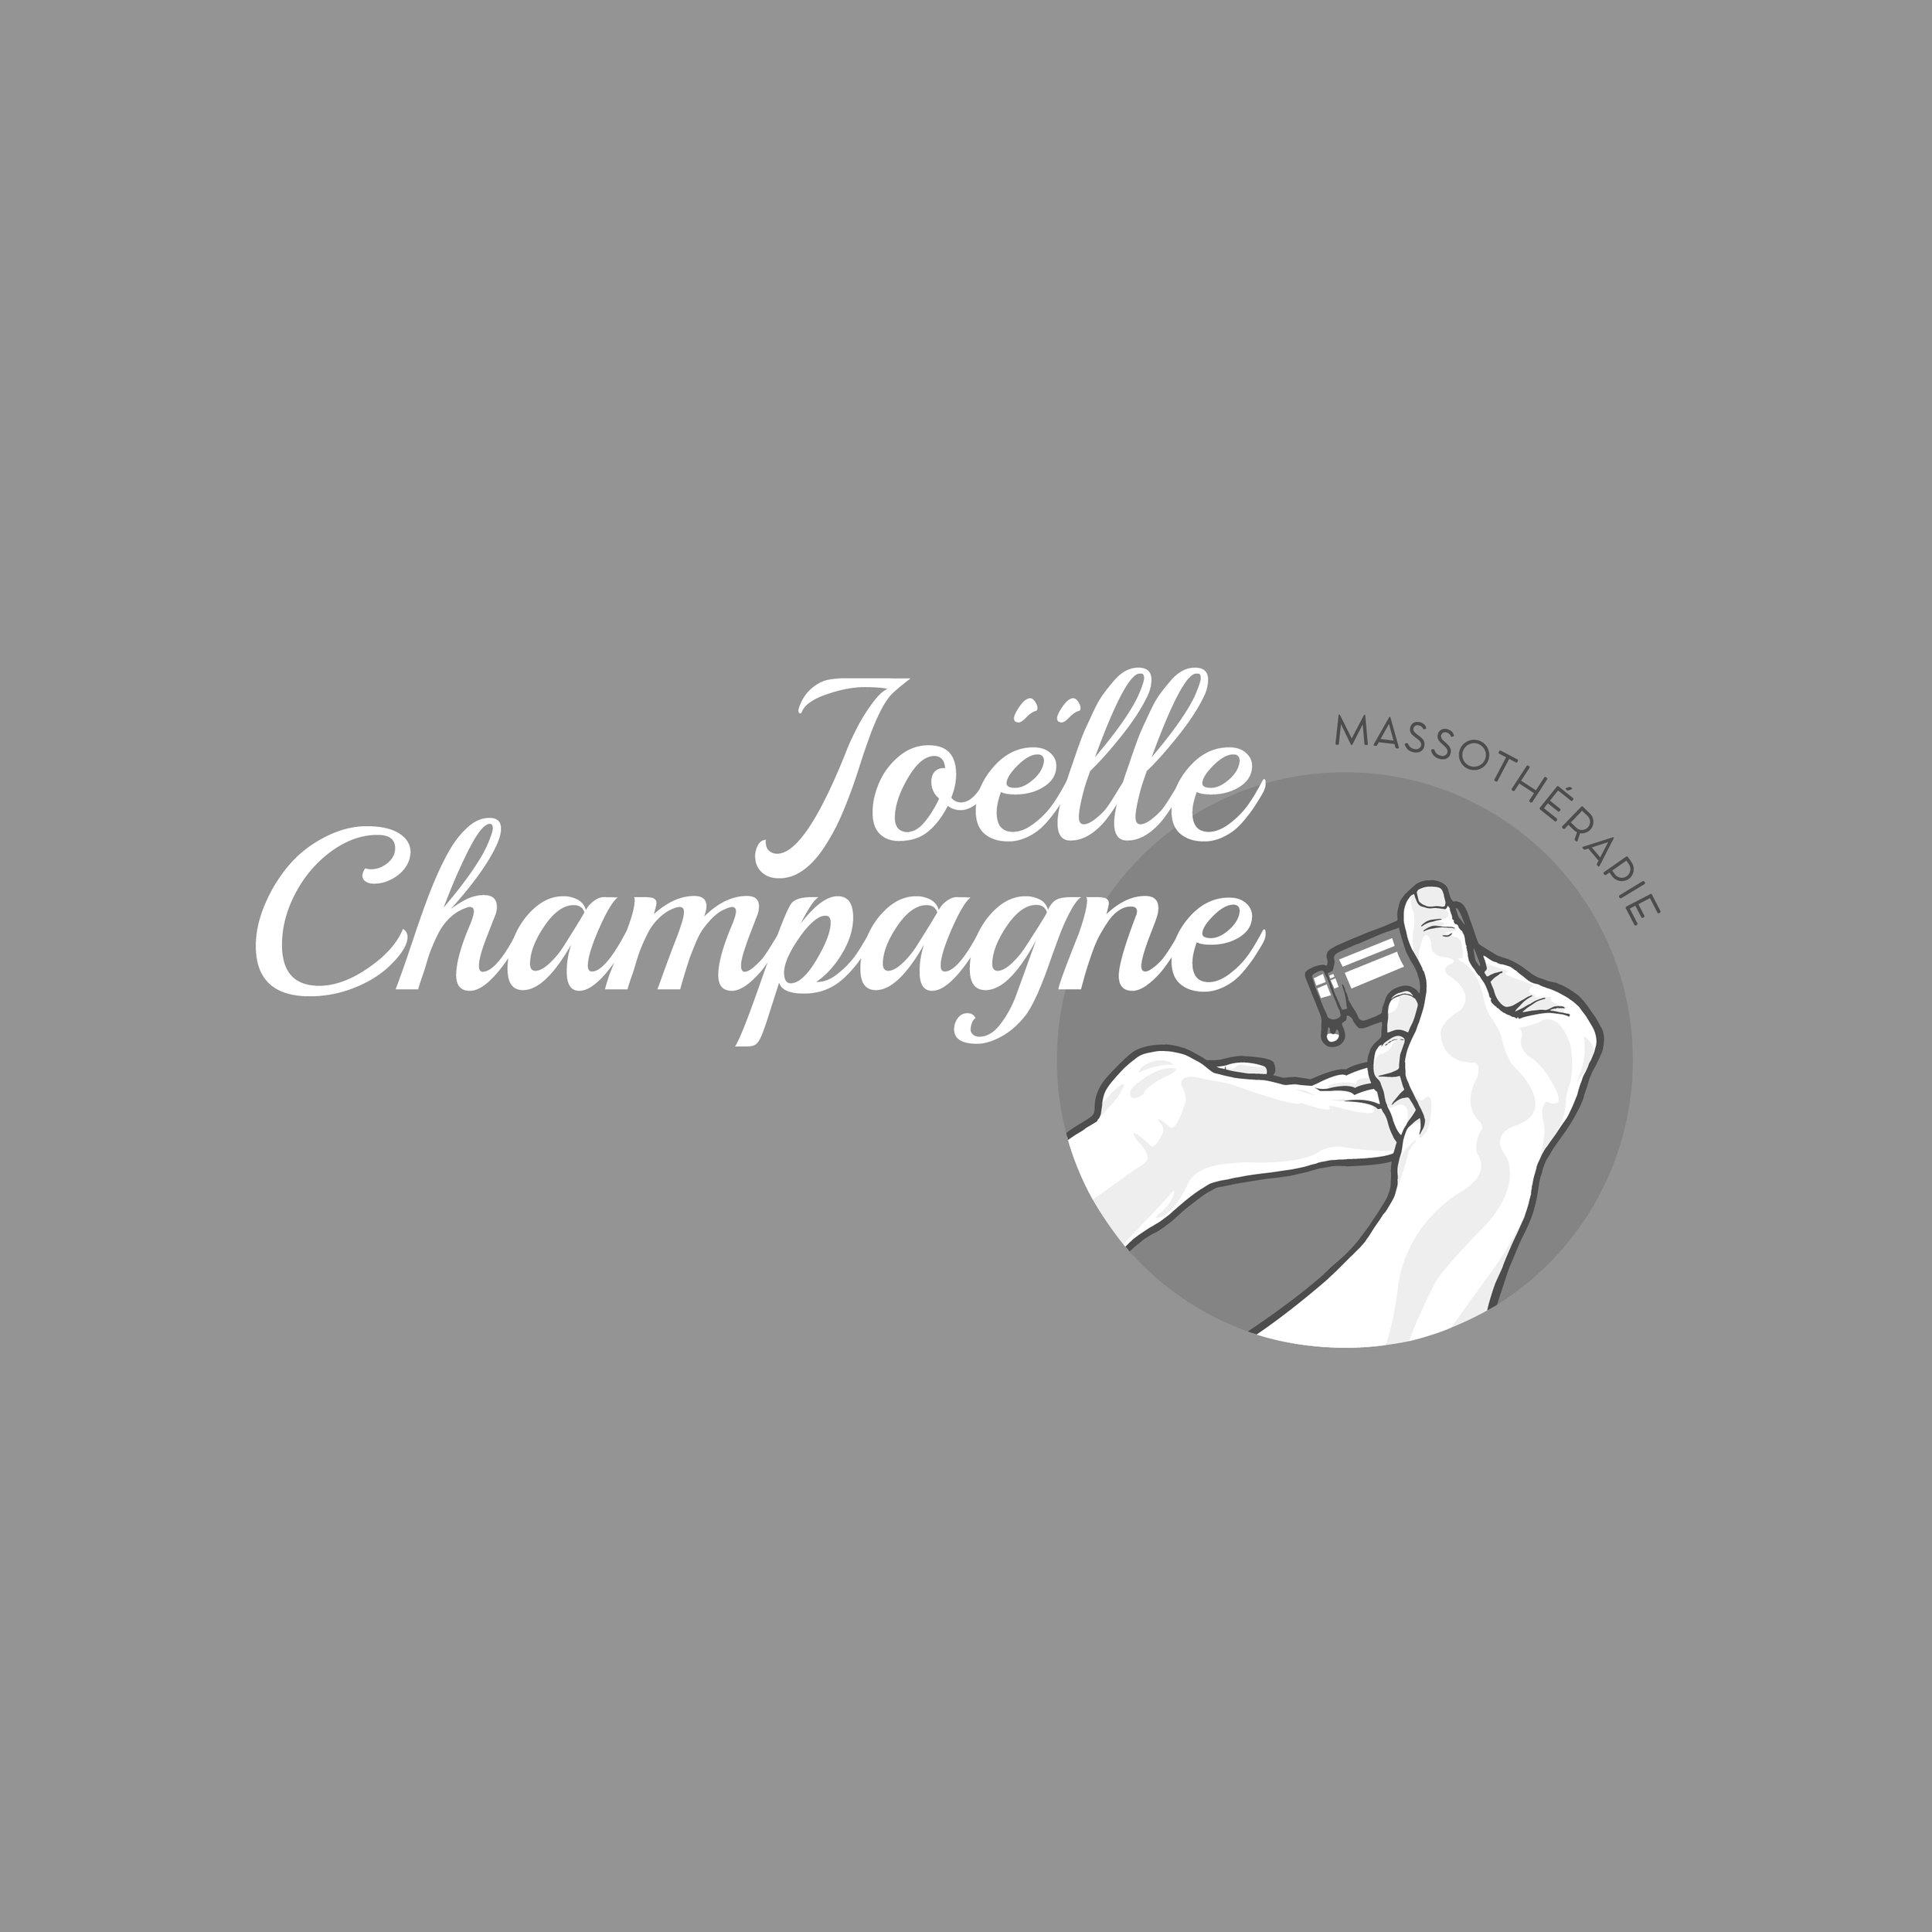 2018-JoelleChampagneMasso-Gris.jpg